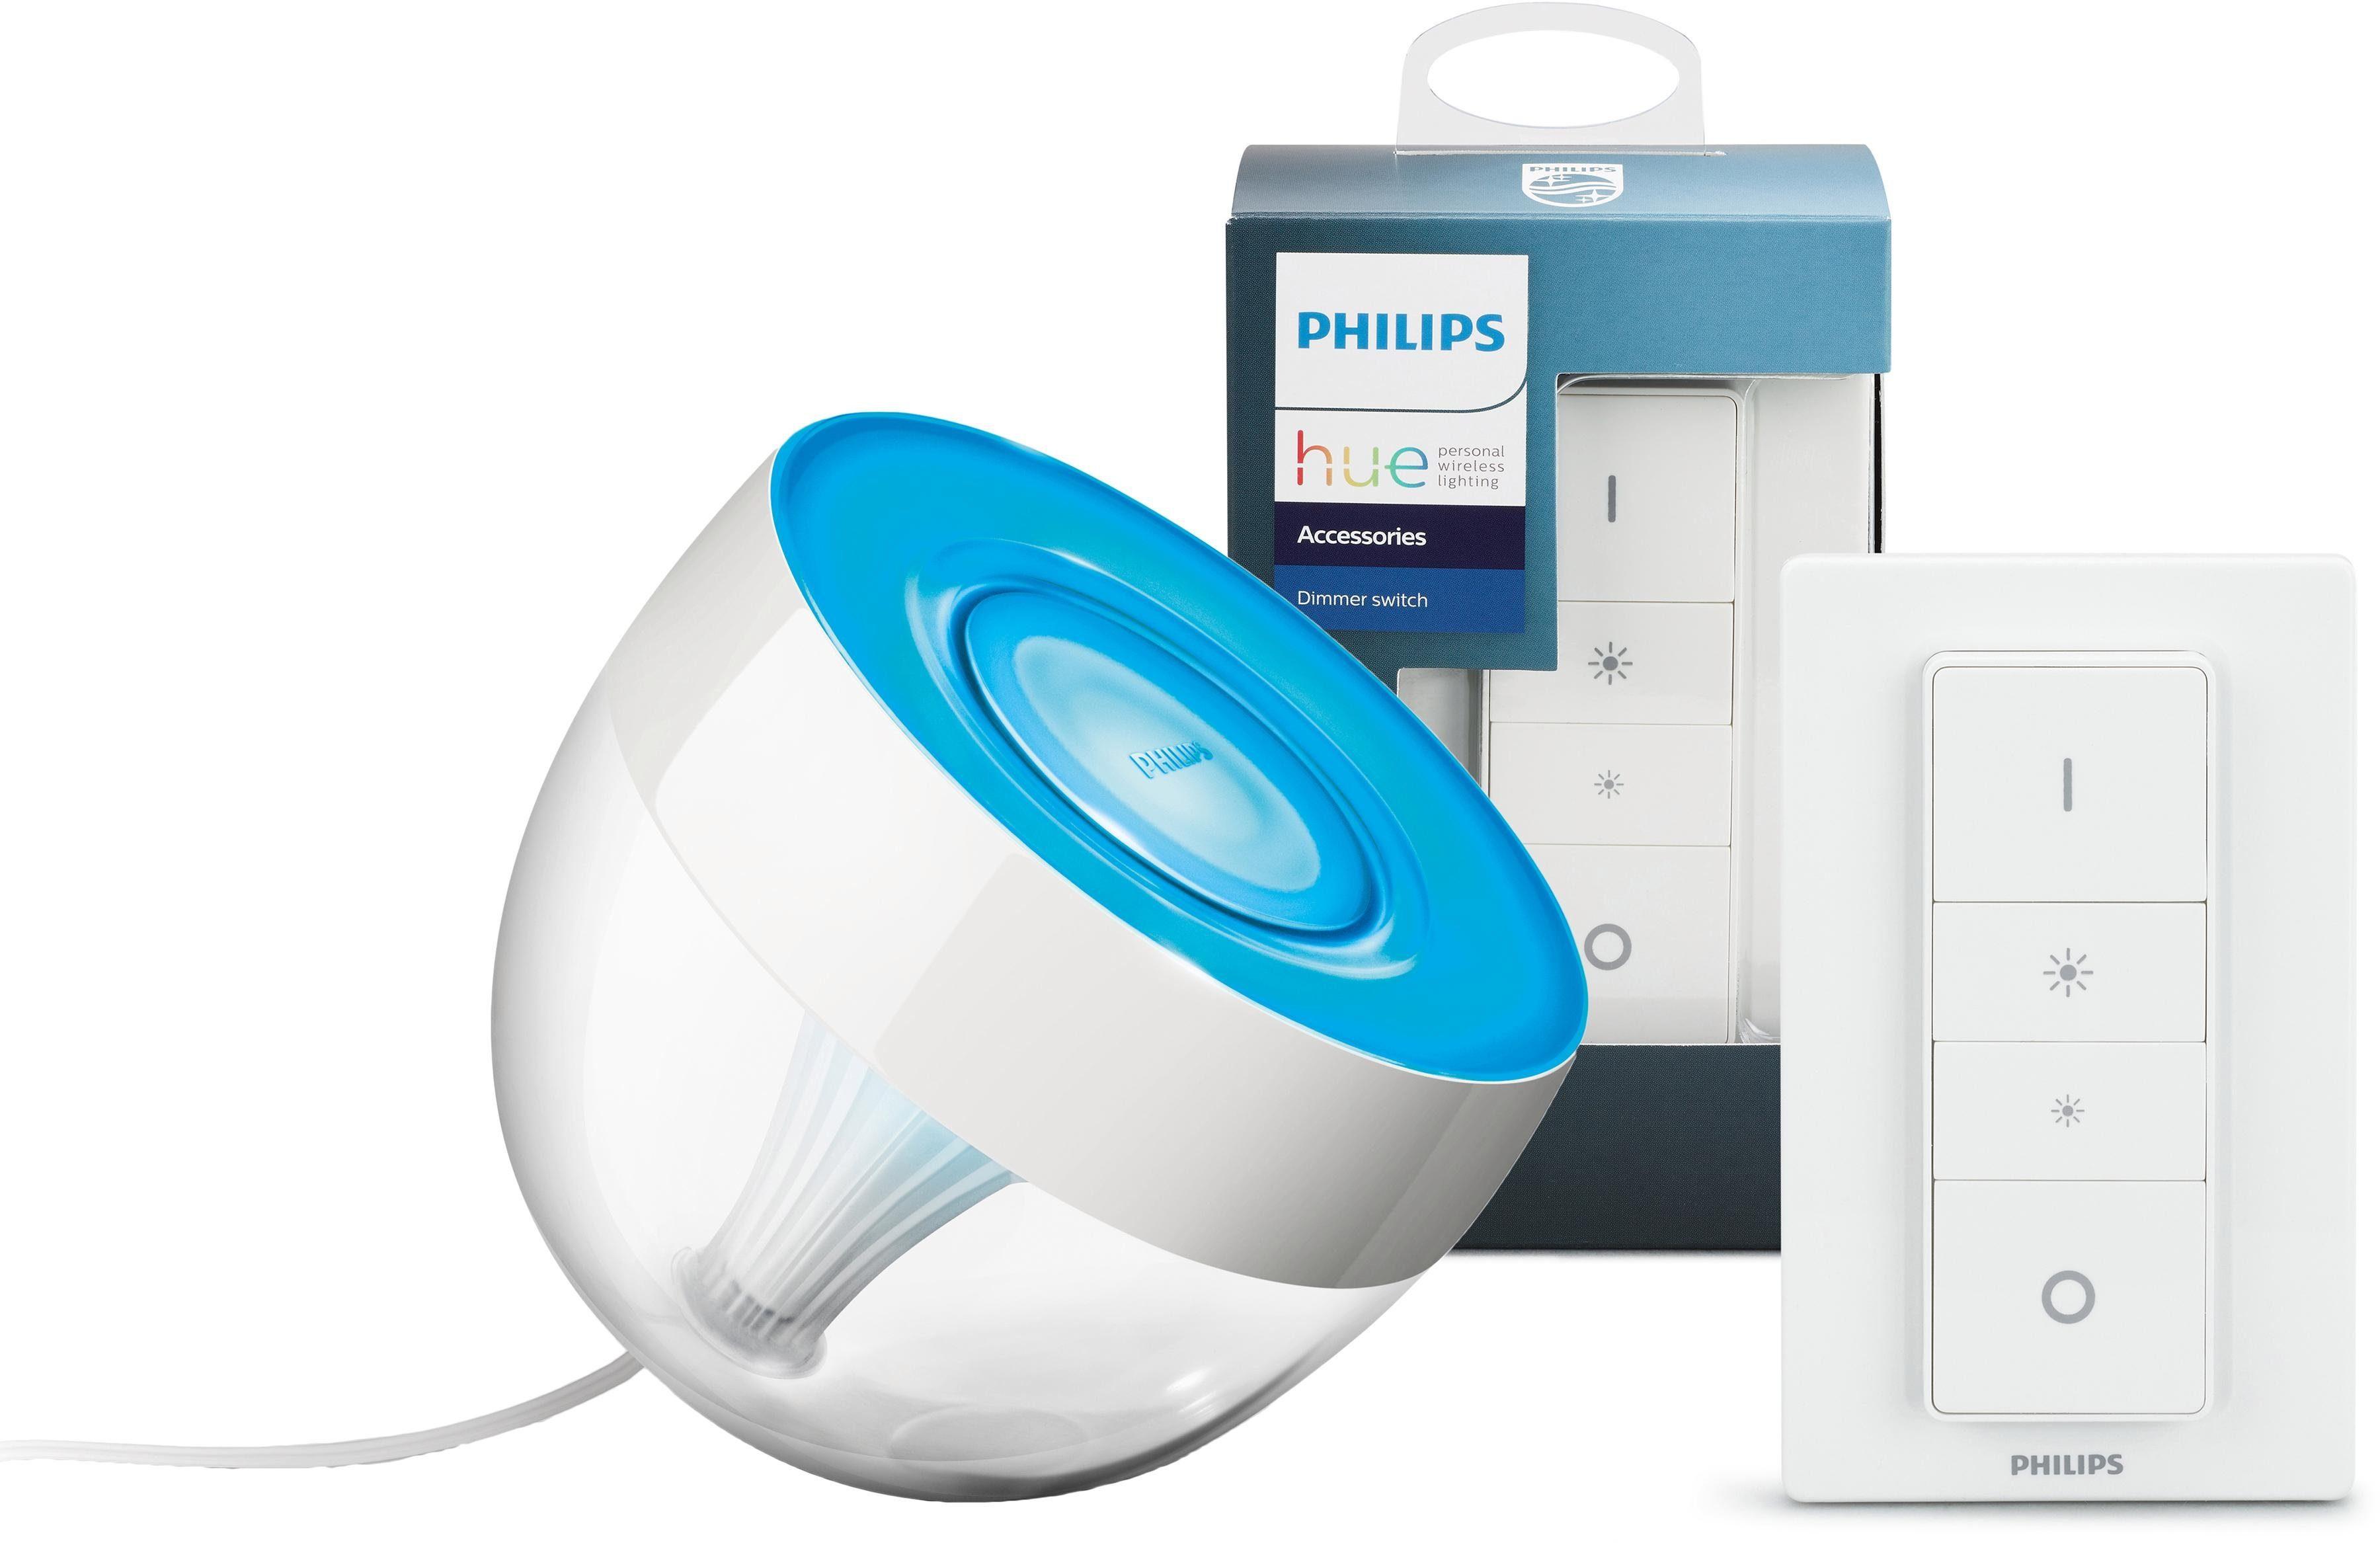 Led Lampen Philips : Led lampe von philips in birnen tropfenform w e v lm